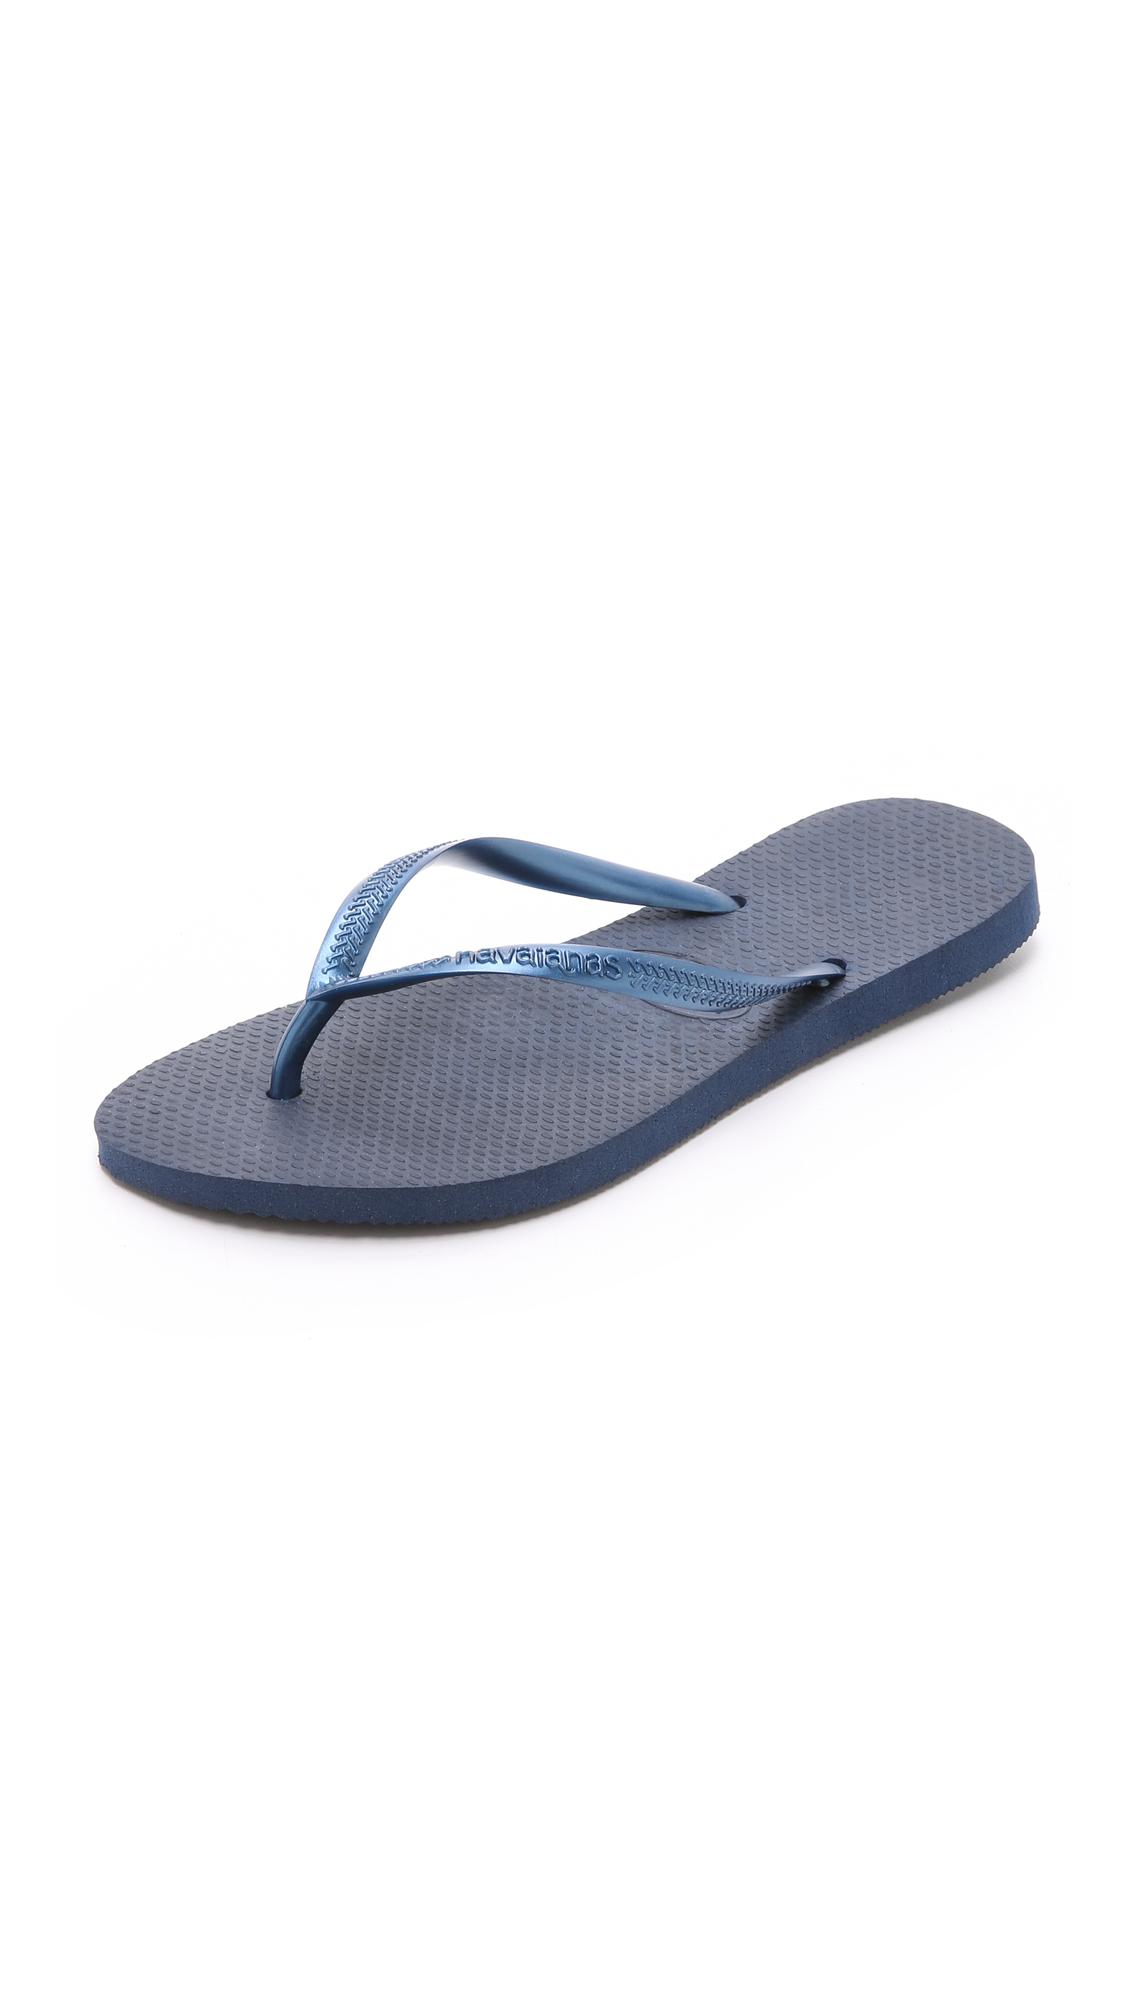 Havaianas Slim Flip Flops - Navy at Shopbop